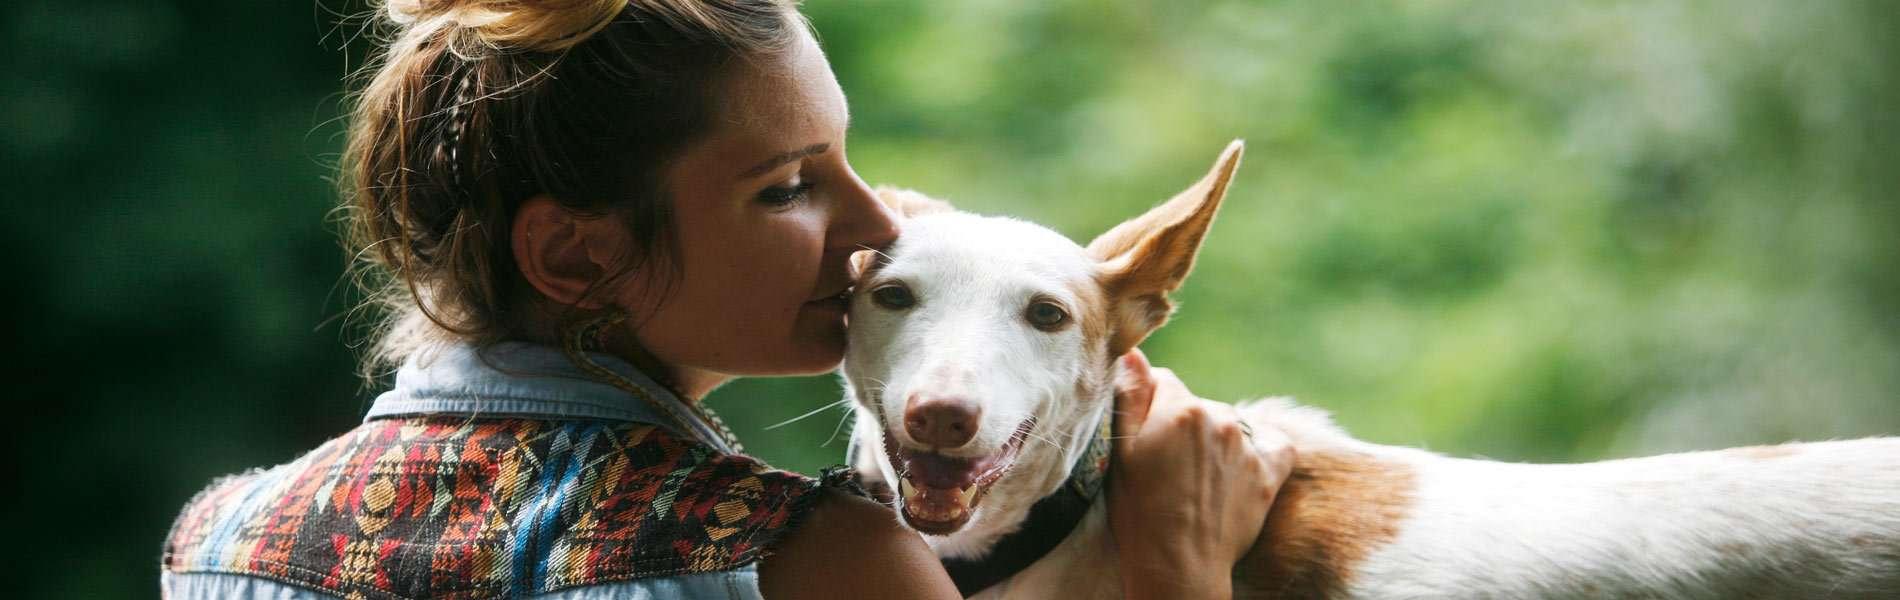 Tierkommunikation Linda Erbe Hund Sinai